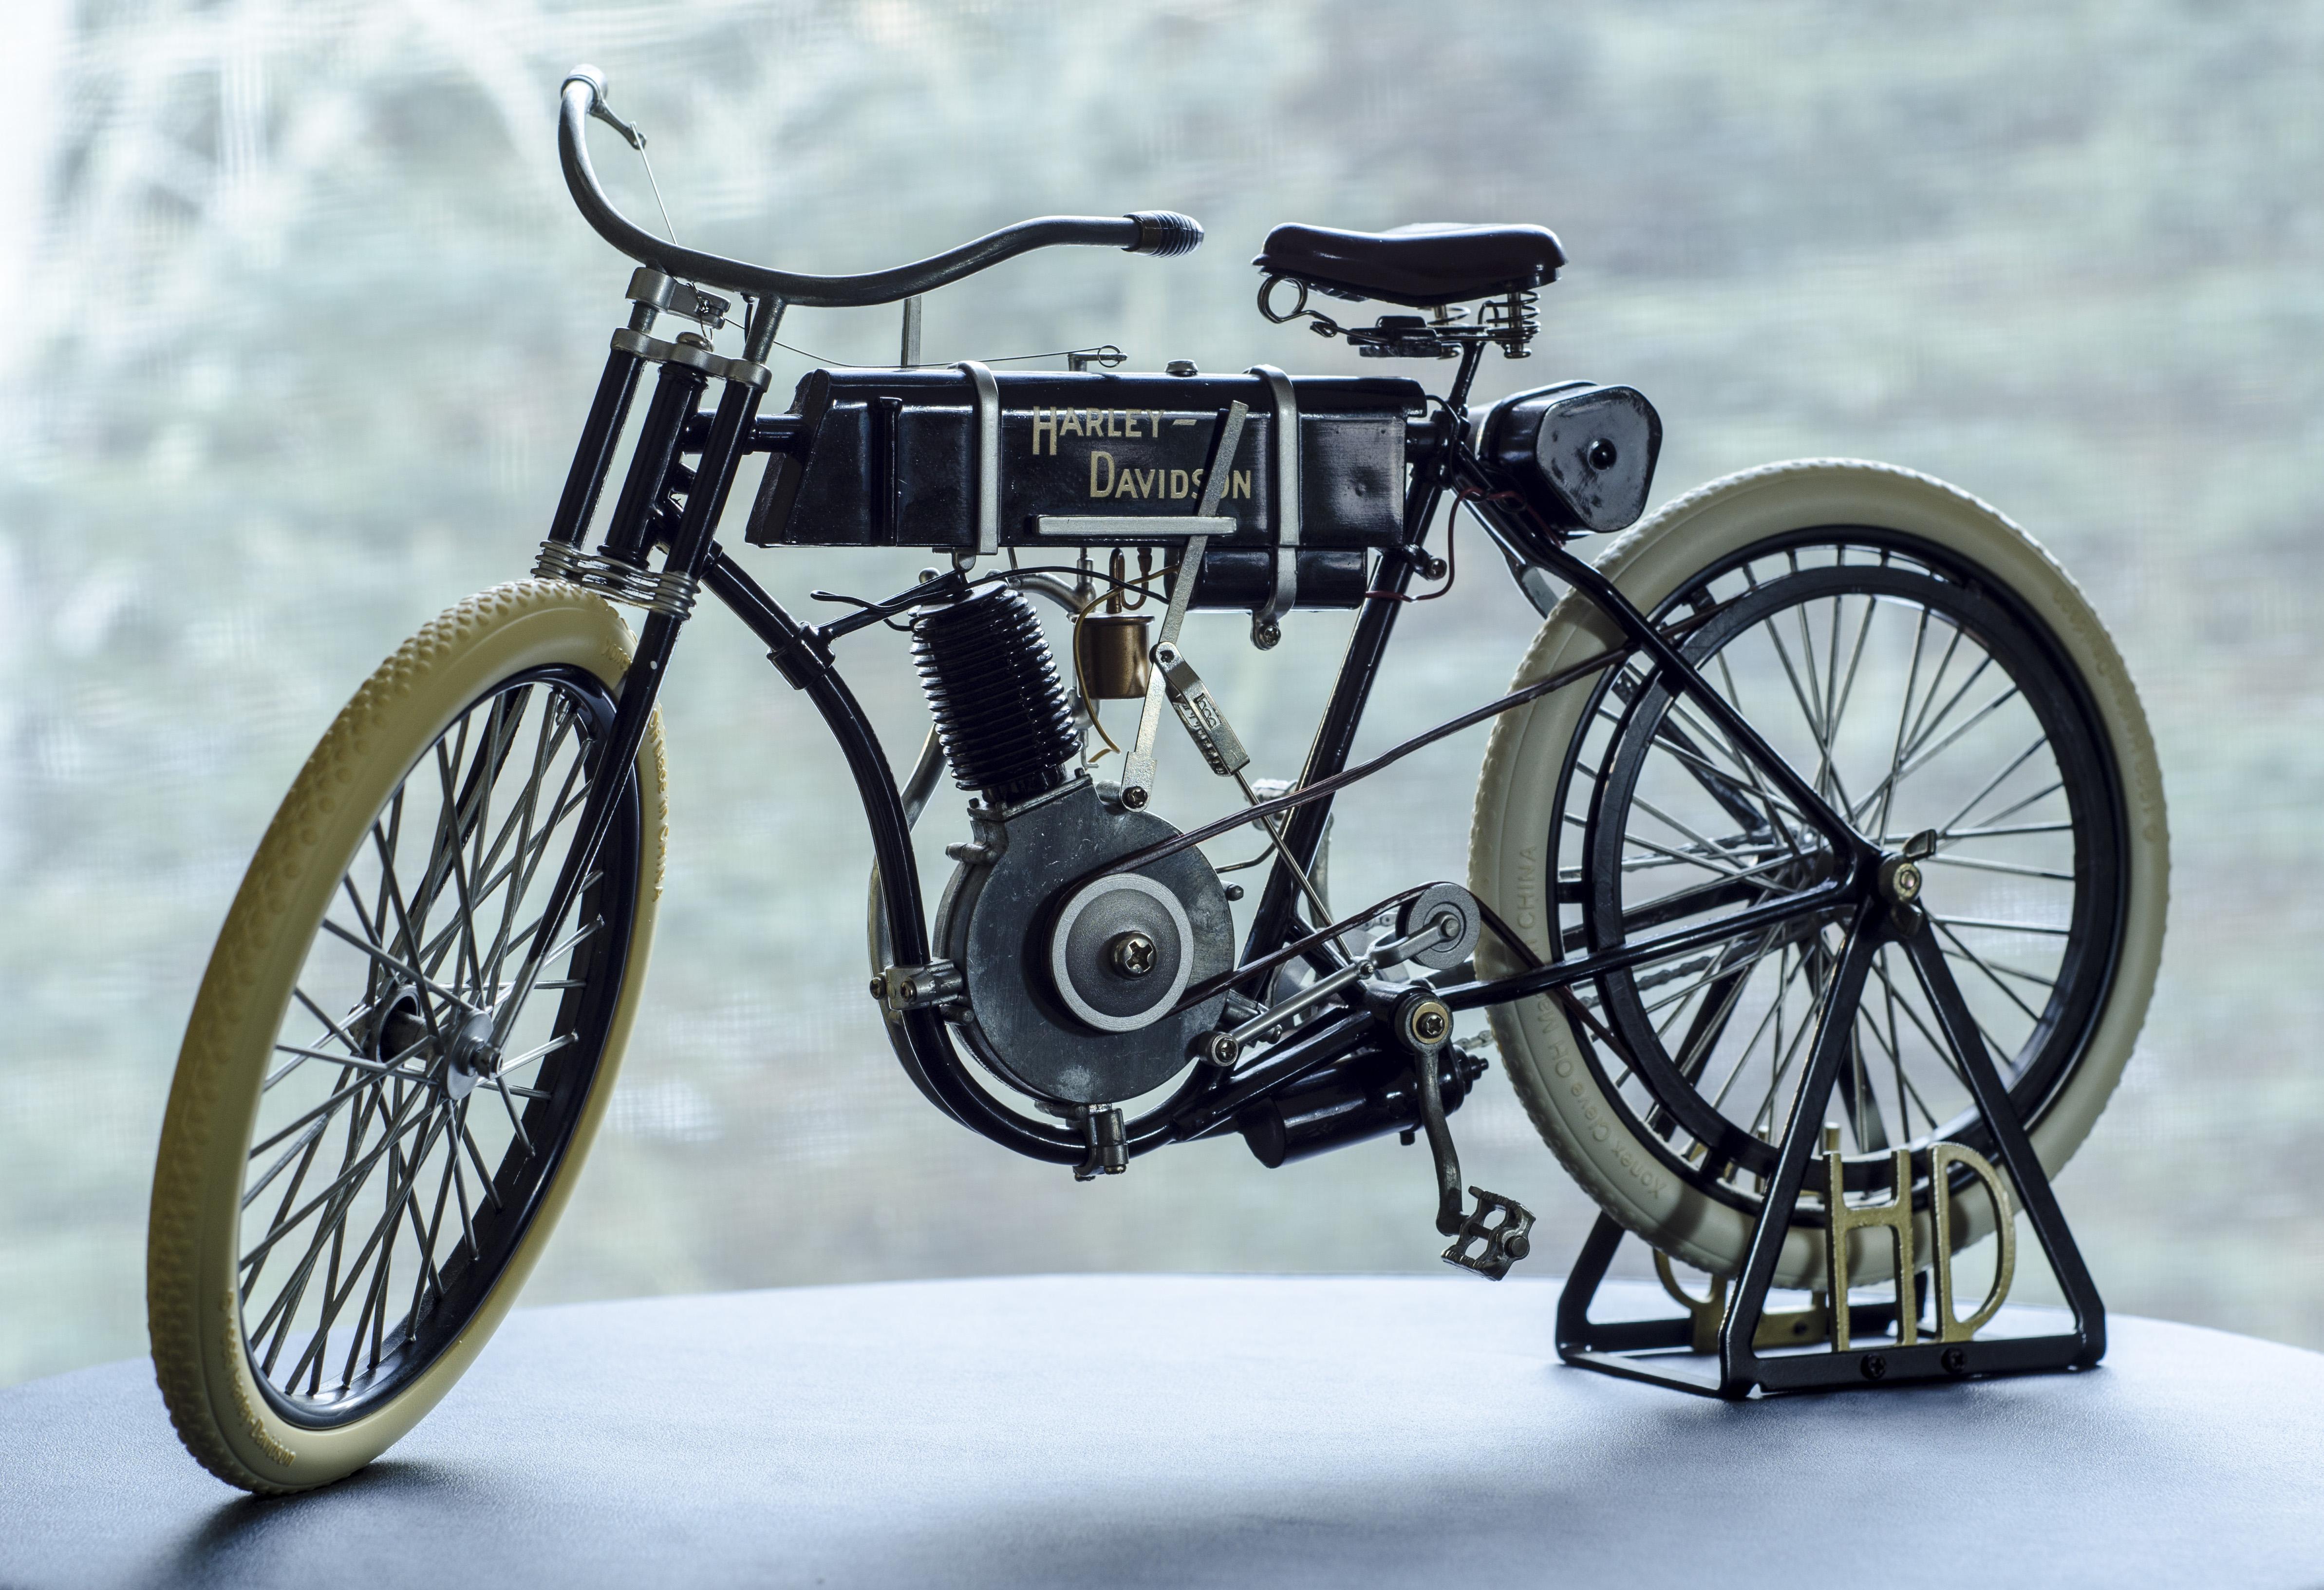 1903 Harley Davidson Photo: free-soft